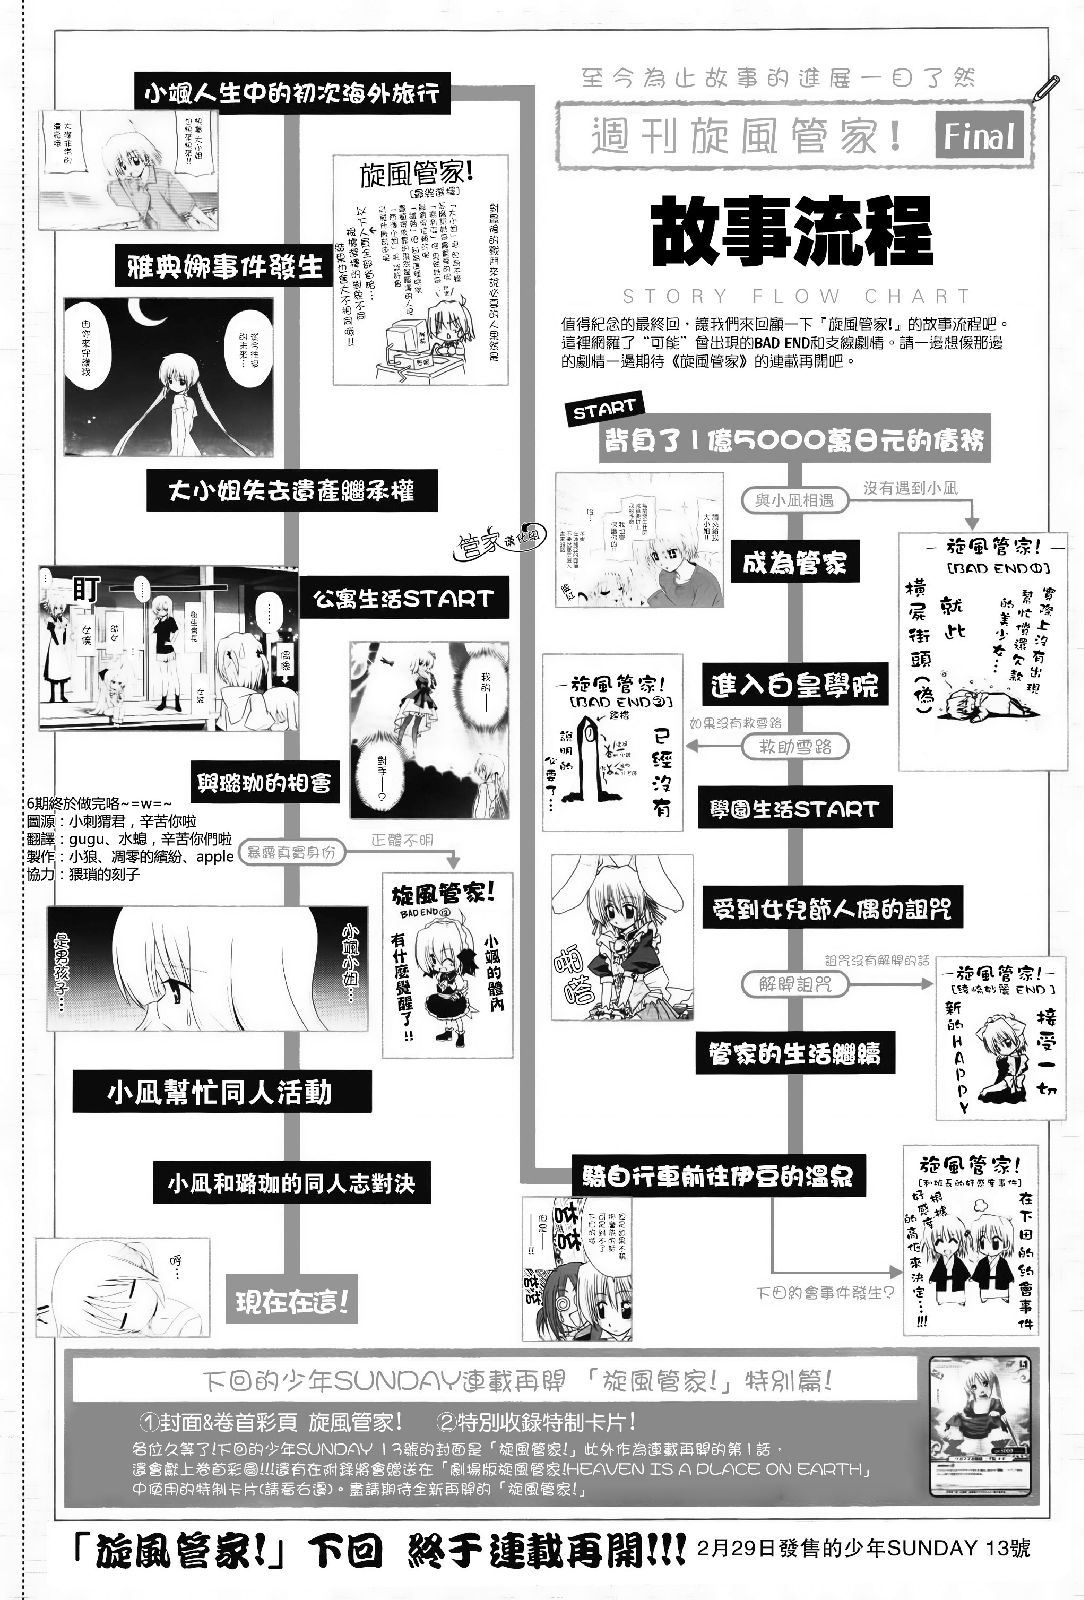 Weekly hayate no gotoku final story flow chart hayate report introduction nvjuhfo Choice Image